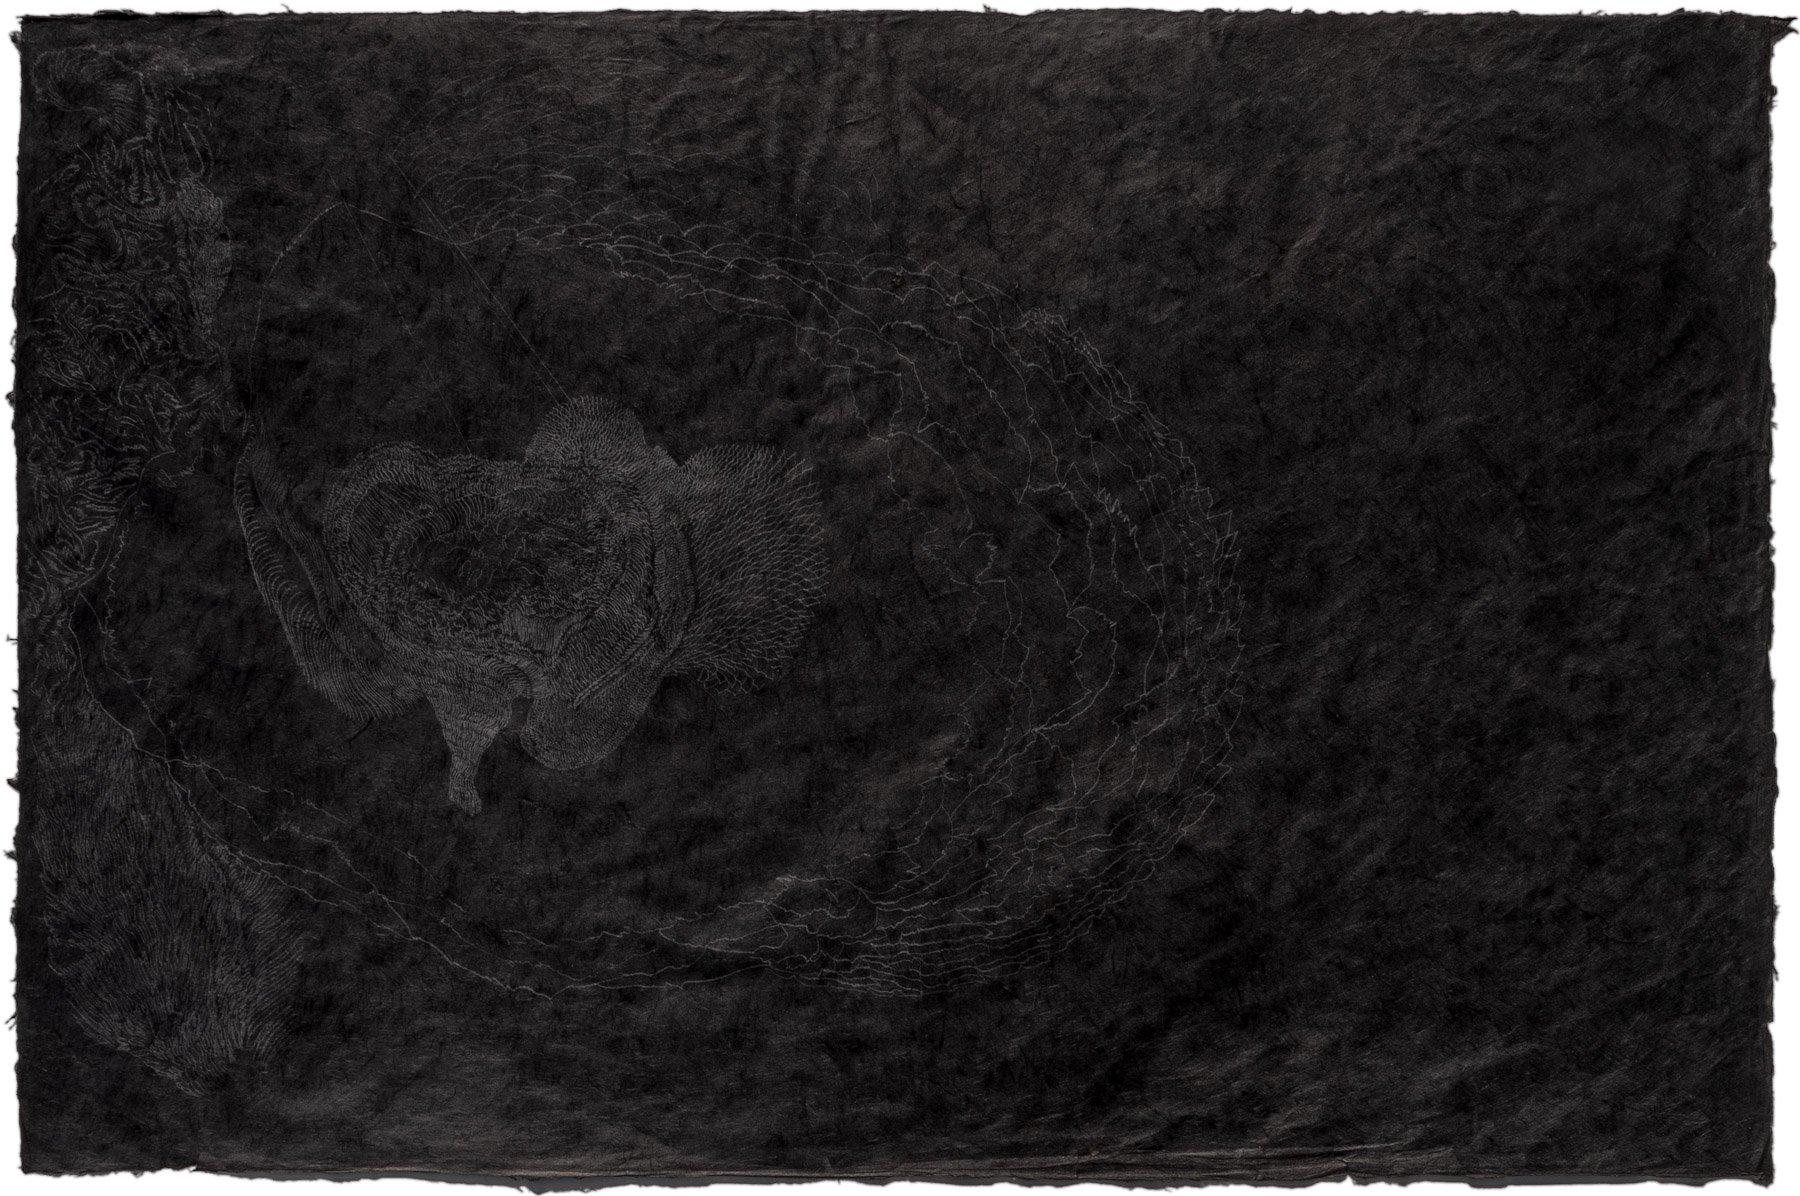 BAHAR BEHBAHANI, Transplant, from Growing Persian Garden series, 2016, graphite on Thai kozo sheet, 20 x 30 inches